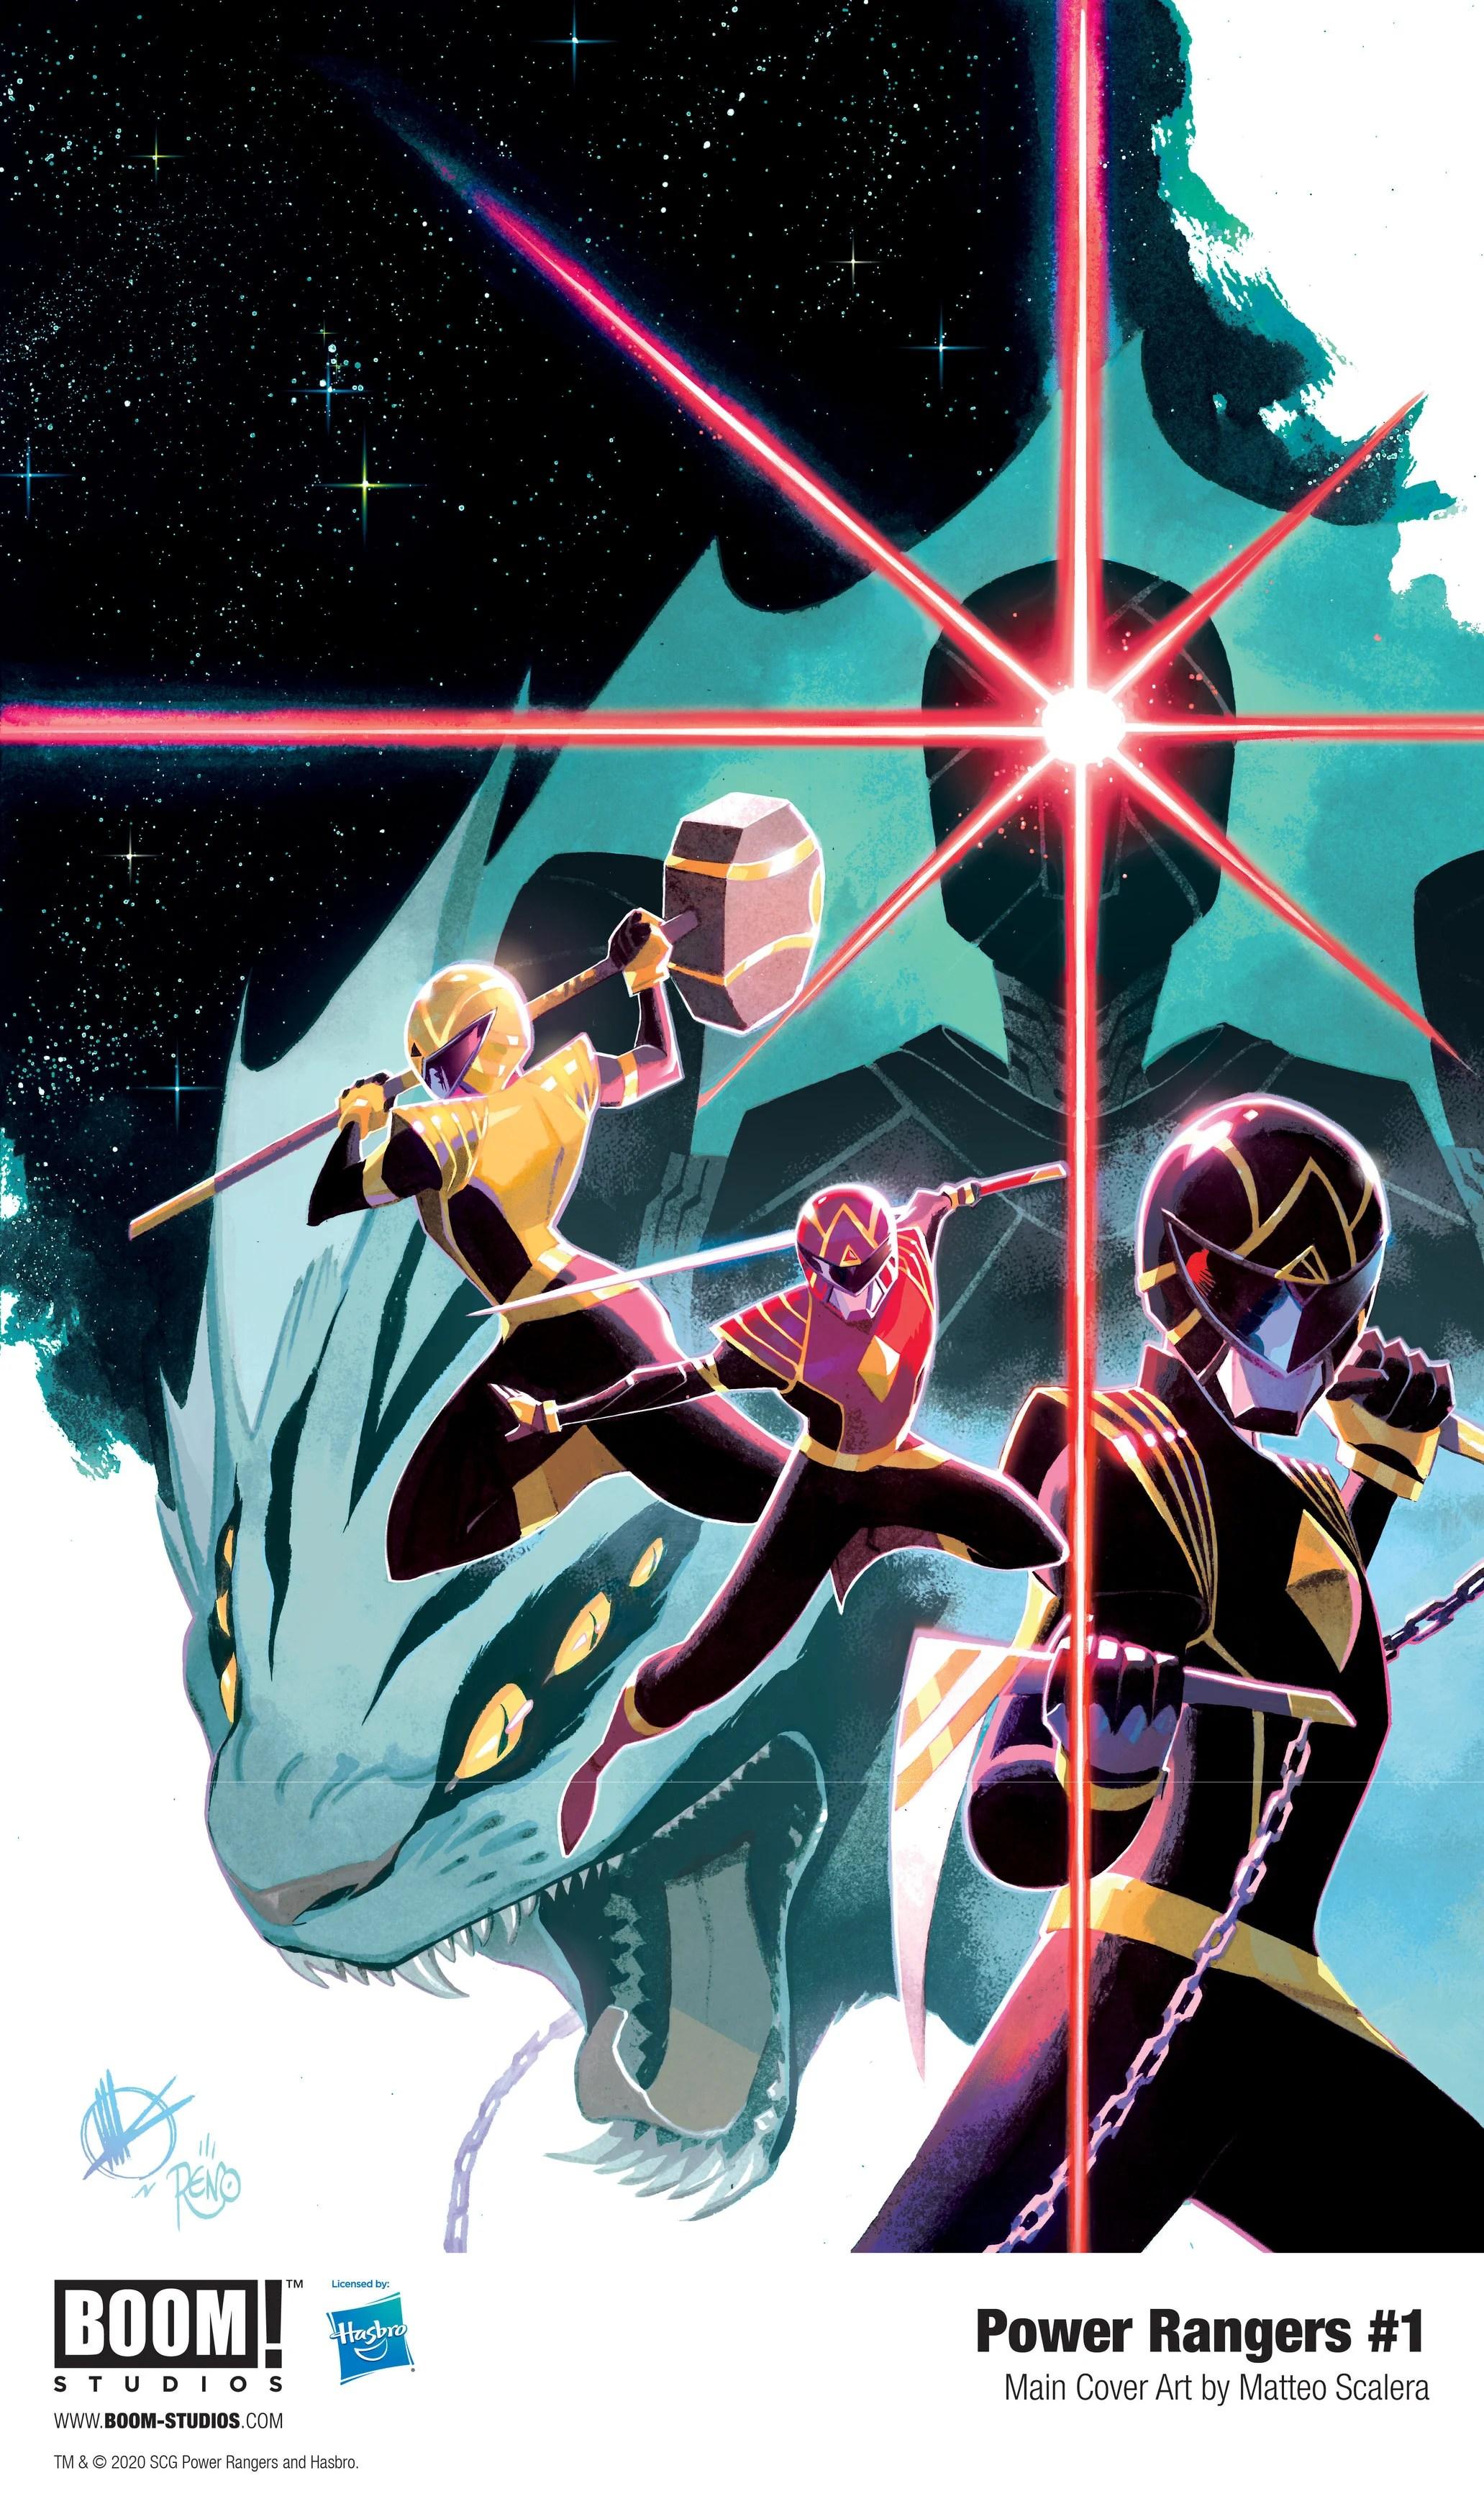 New Power Rangers : power, rangers, Mighty, Morphin:, BOOM!, Studios', Power, Rangers, Relaunch, Introduces, Green, Ranger